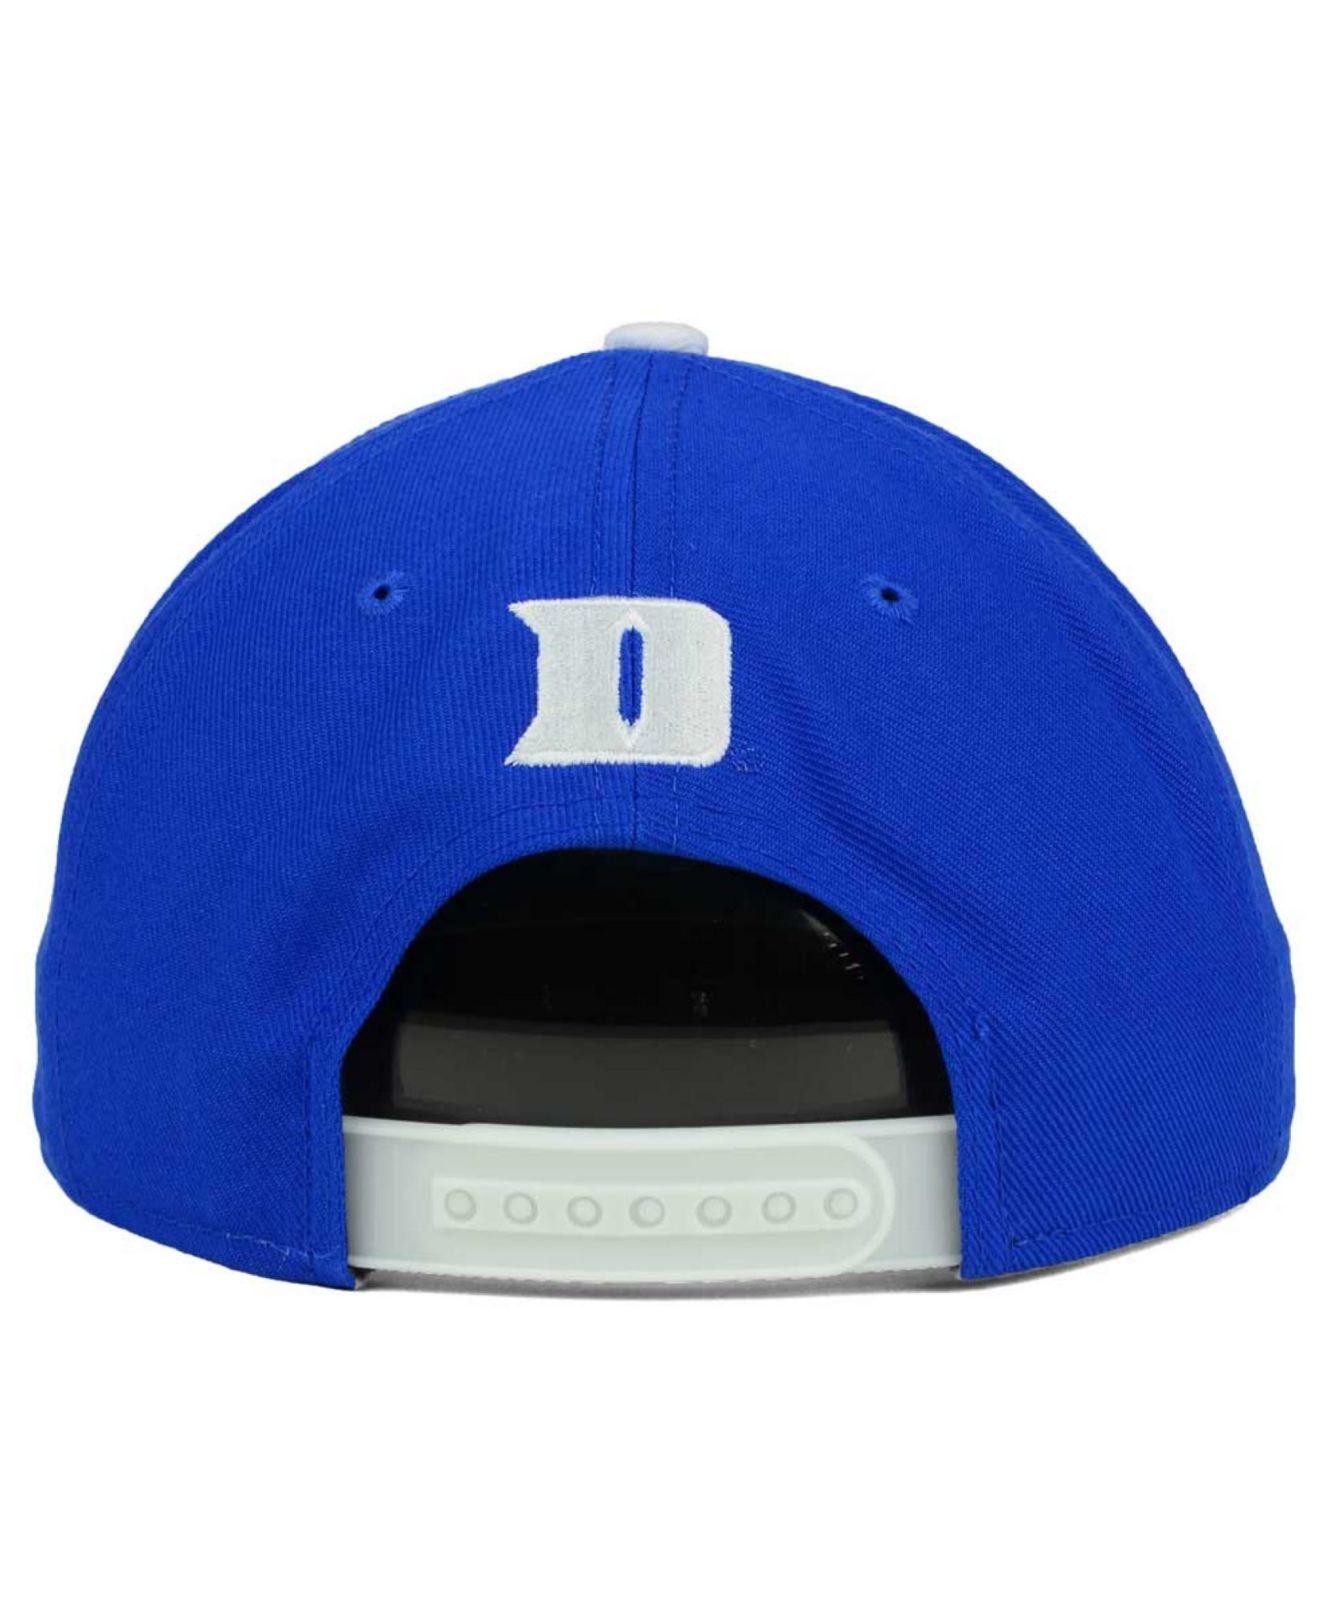 88ad9122 Nike Duke Blue Devils True Hardwood Seasonal Cap in Blue for Men - Lyst